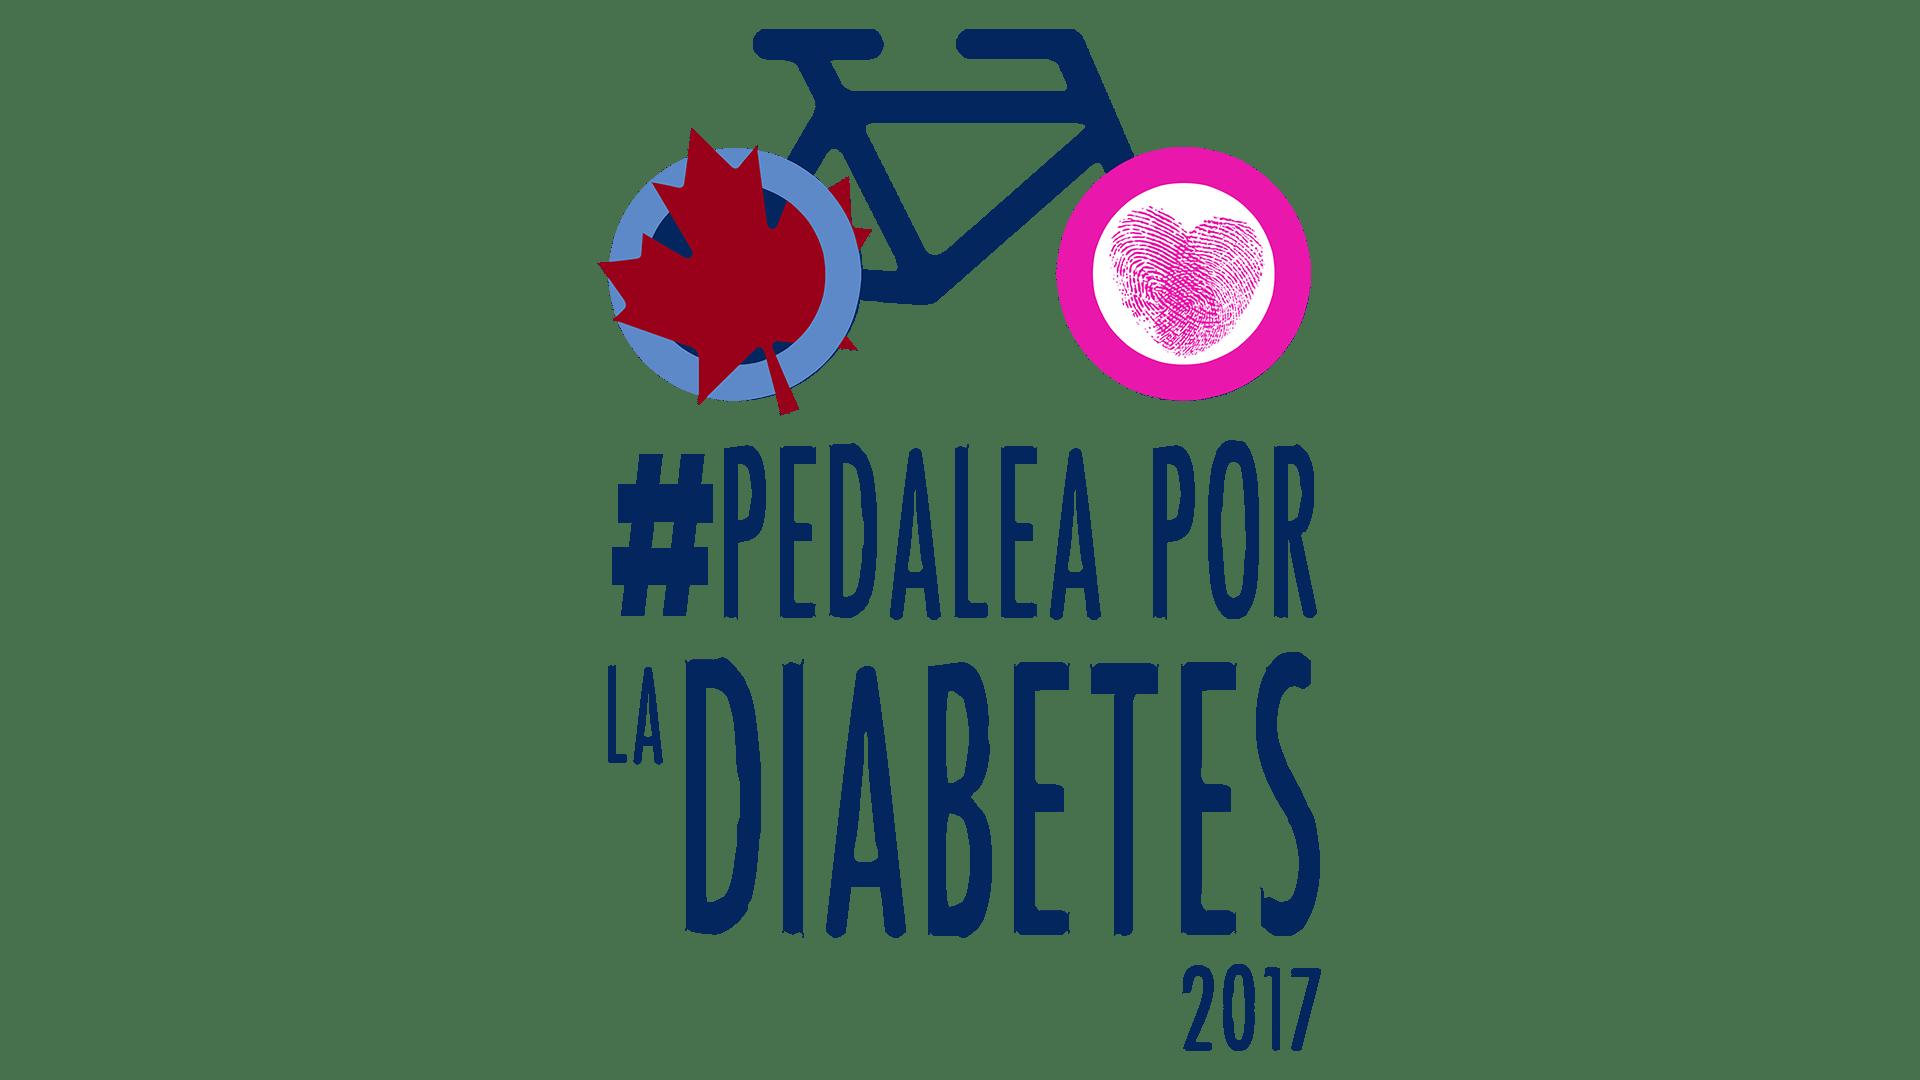 logo pedaleaporladiabetes2017.azul